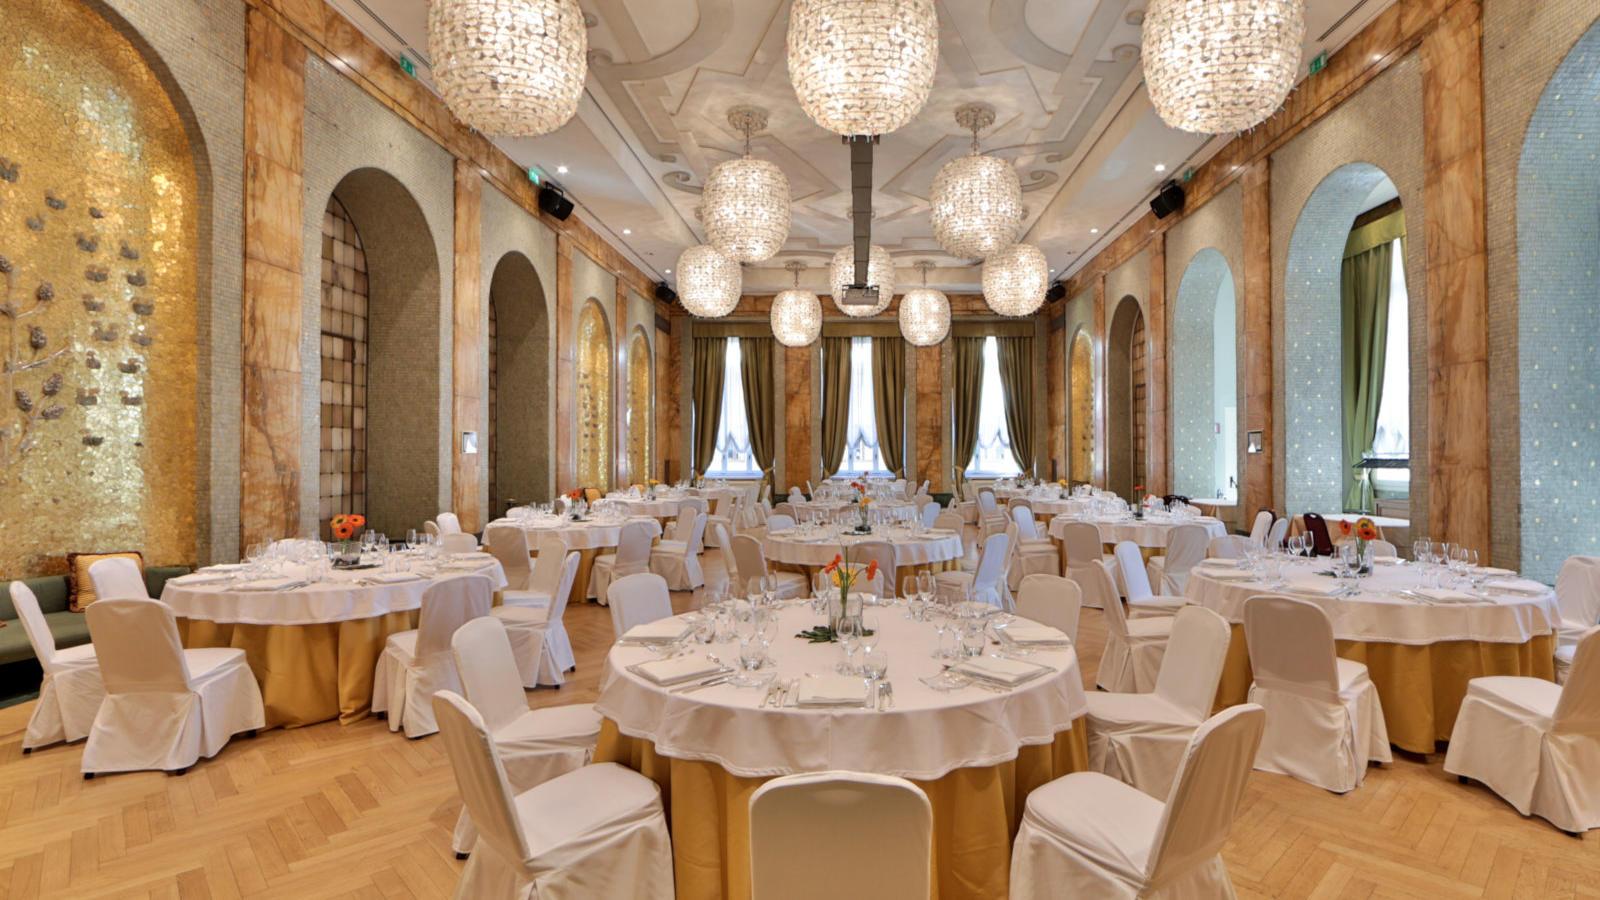 BanquetHall